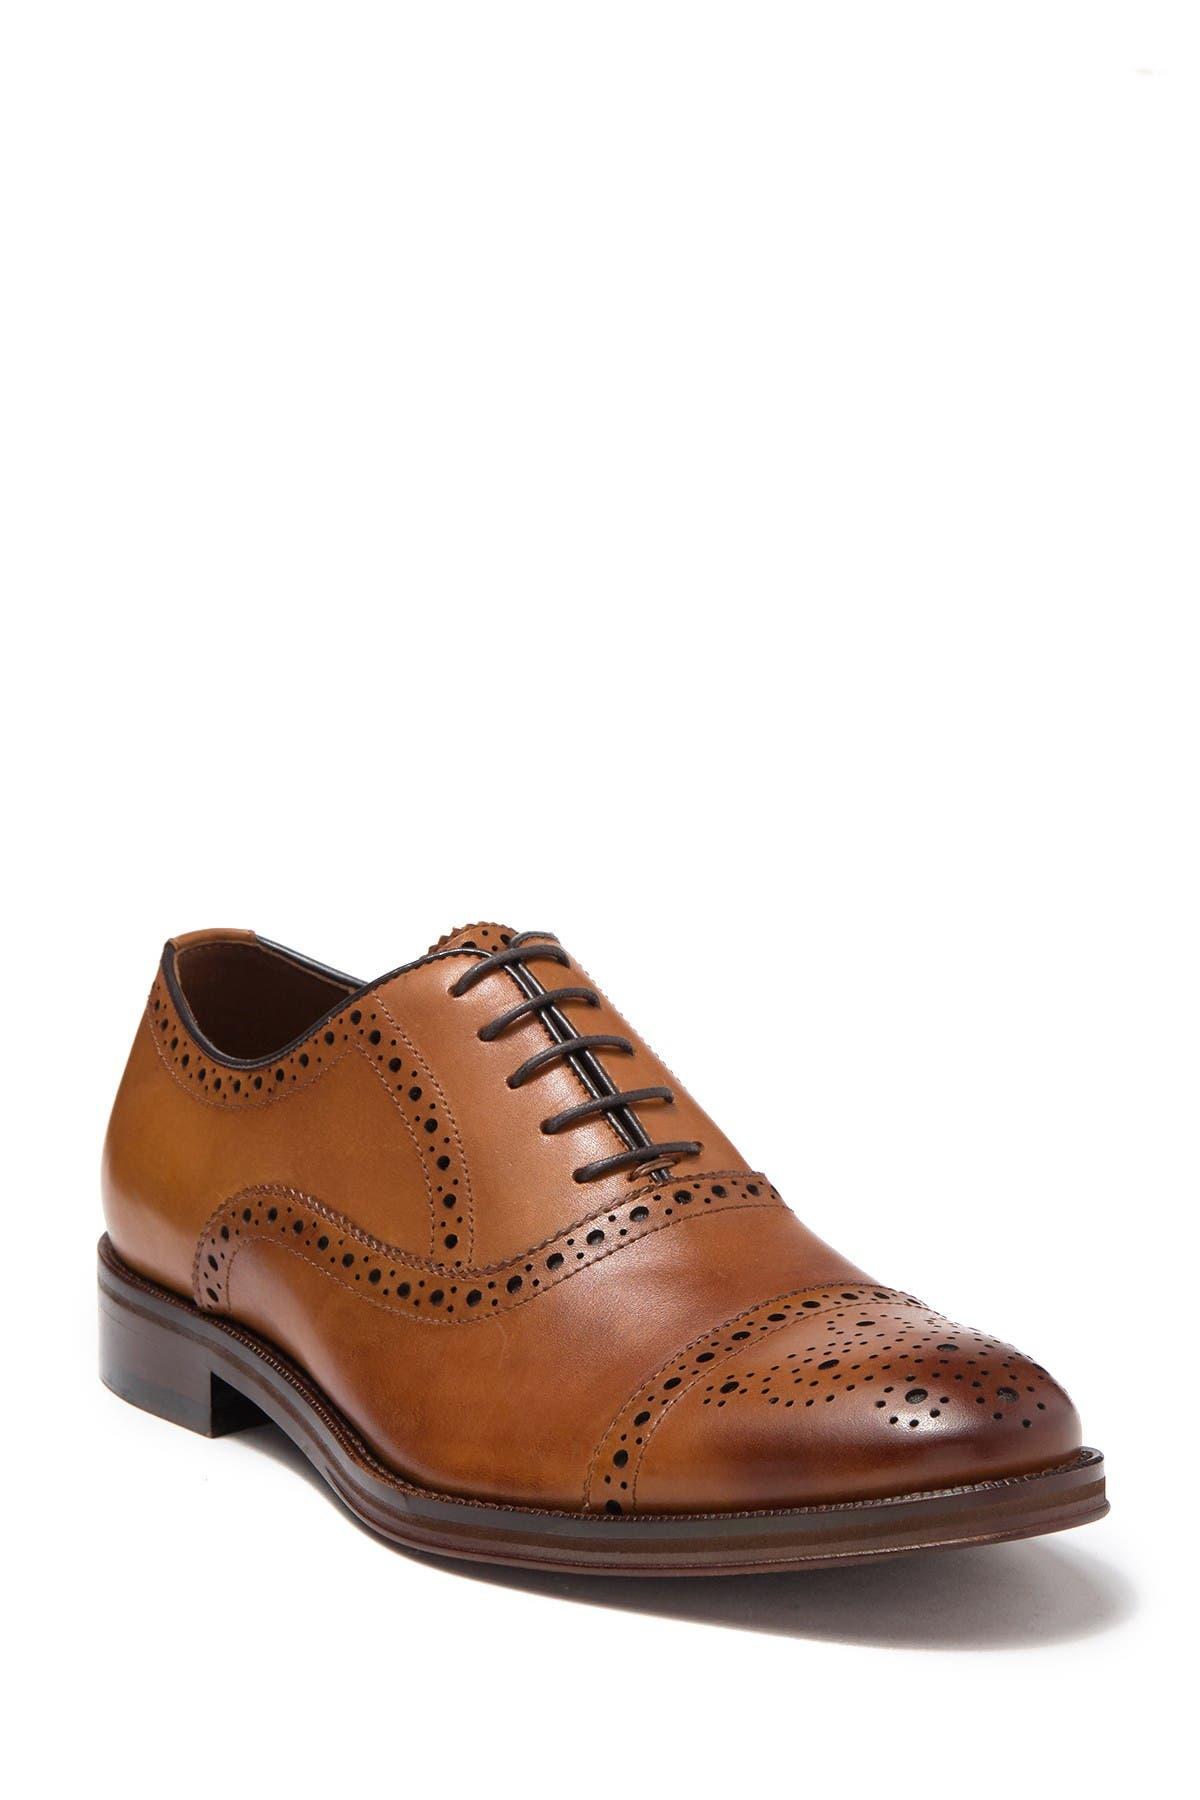 Image of Gordon Rush Gabriel Cap Toe Leather Oxford